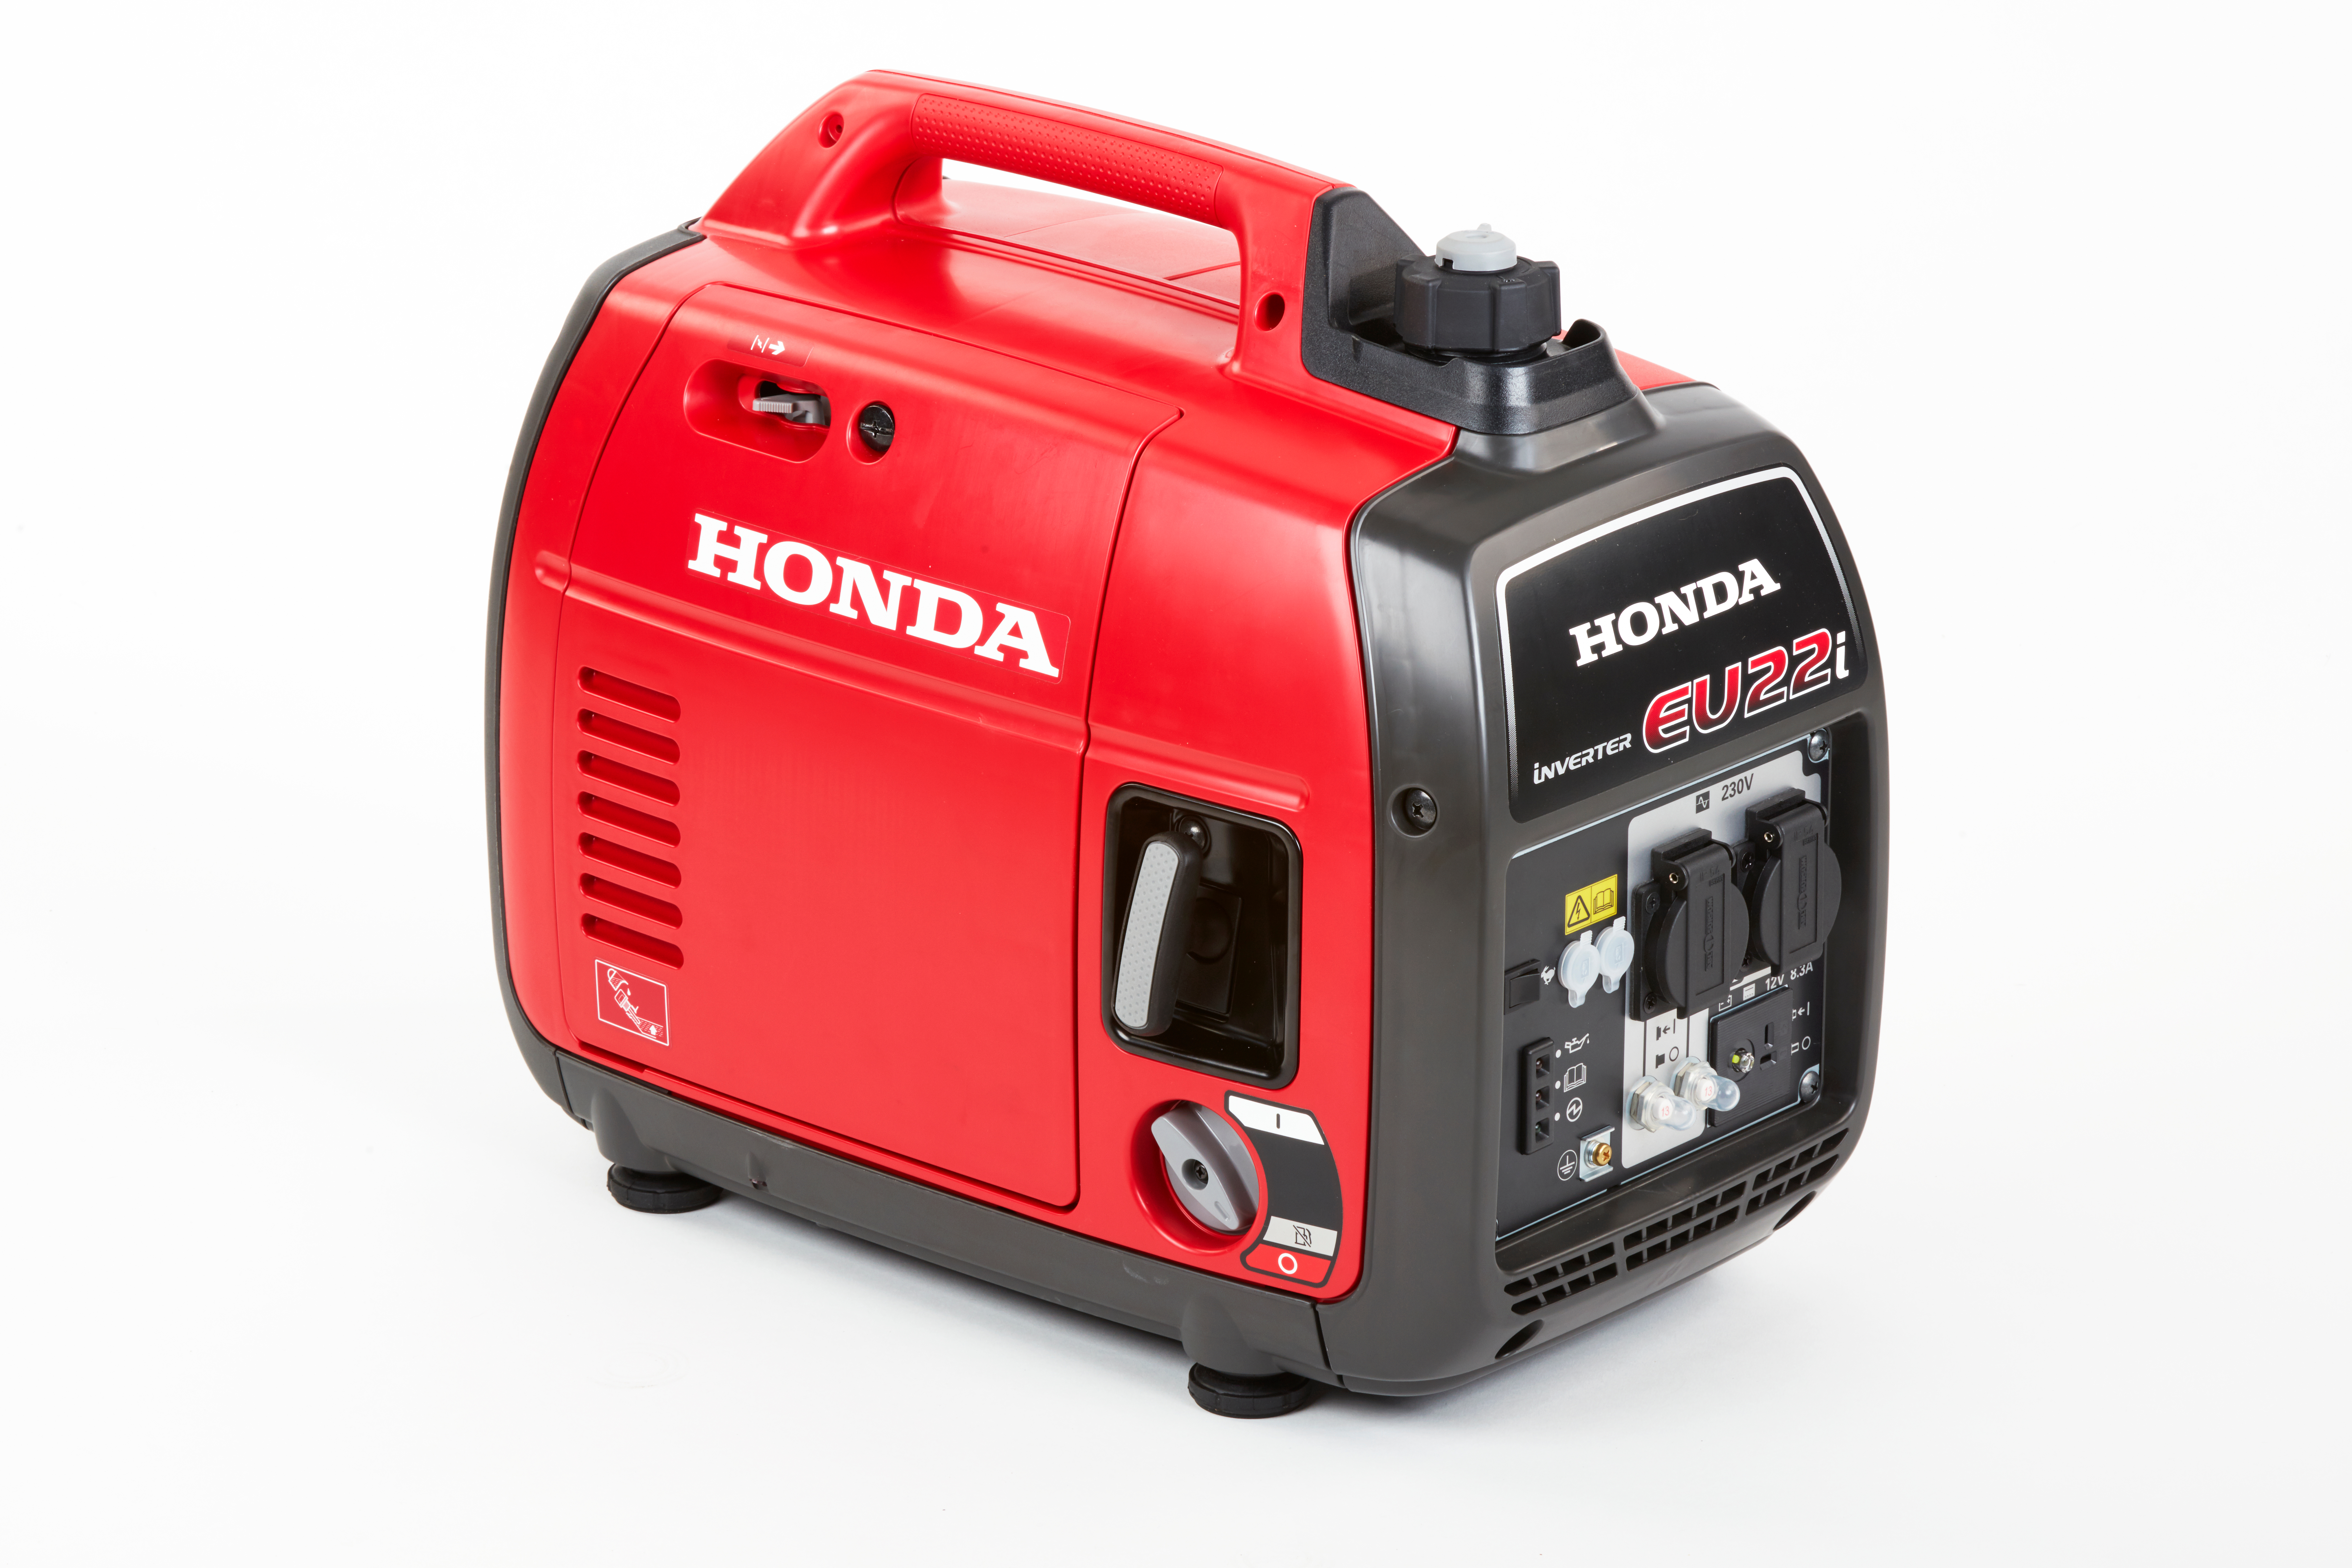 Portable Honda inverter generator s the job done in remote